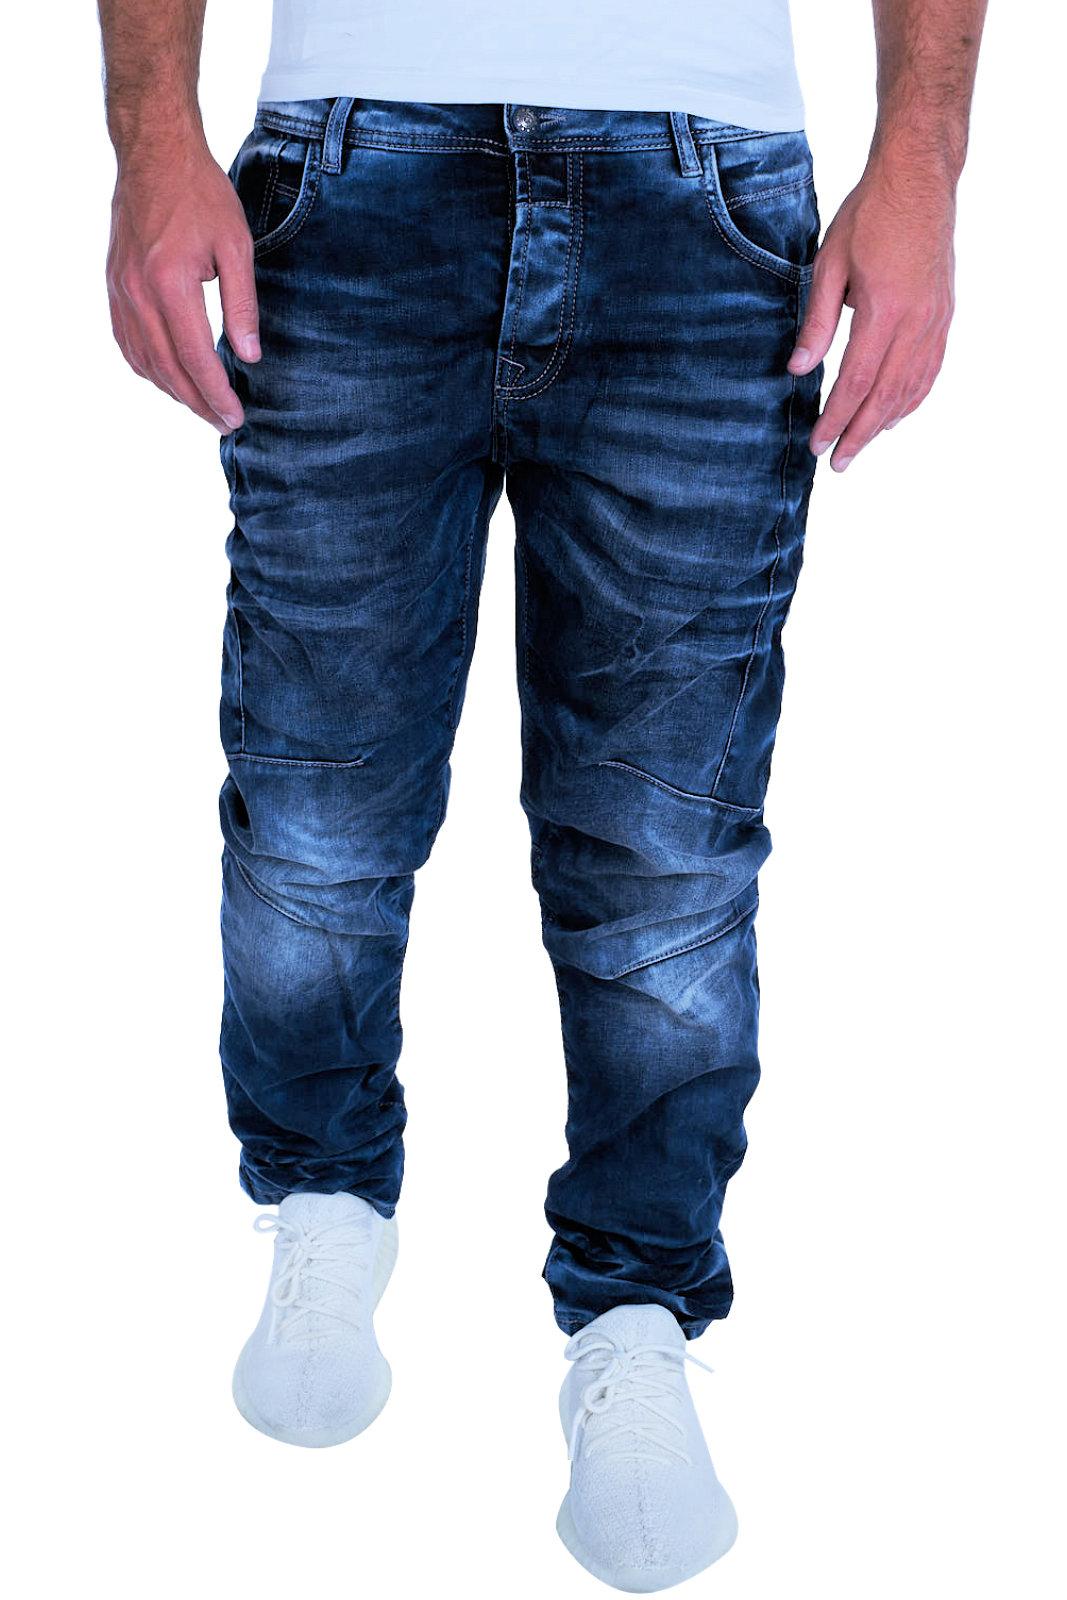 CIPO Baxx & Baxx CIPO hommes Jeans Clubwear Denim Pantalon cd286 SlimFit tendance NEUF cd286 7f13c8